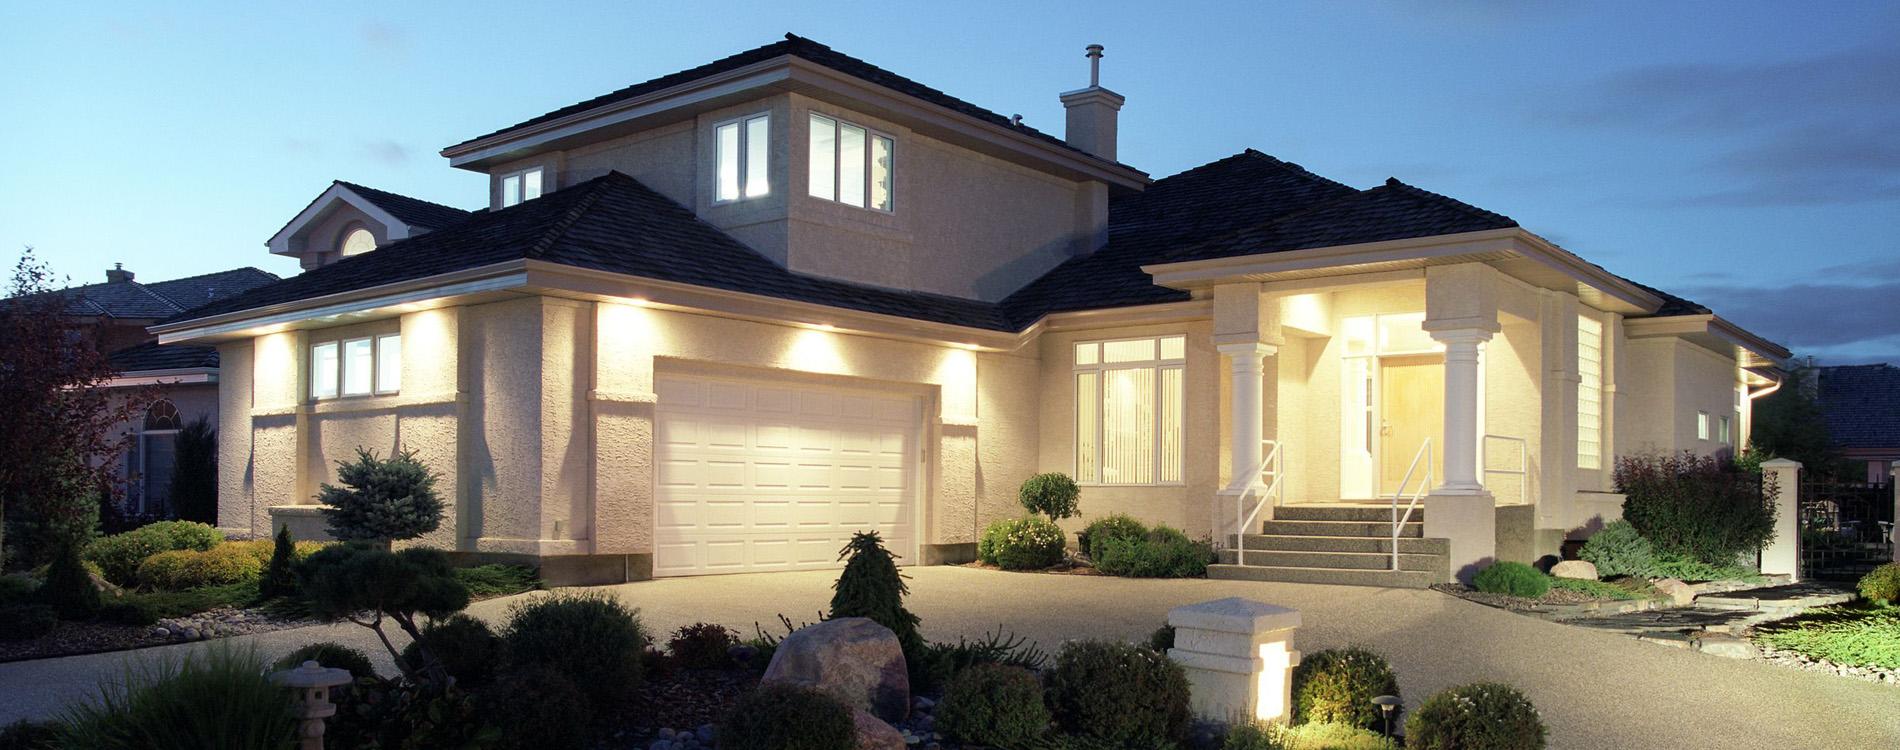 Home croteau real estate services las vegas for Las vegas dream homes